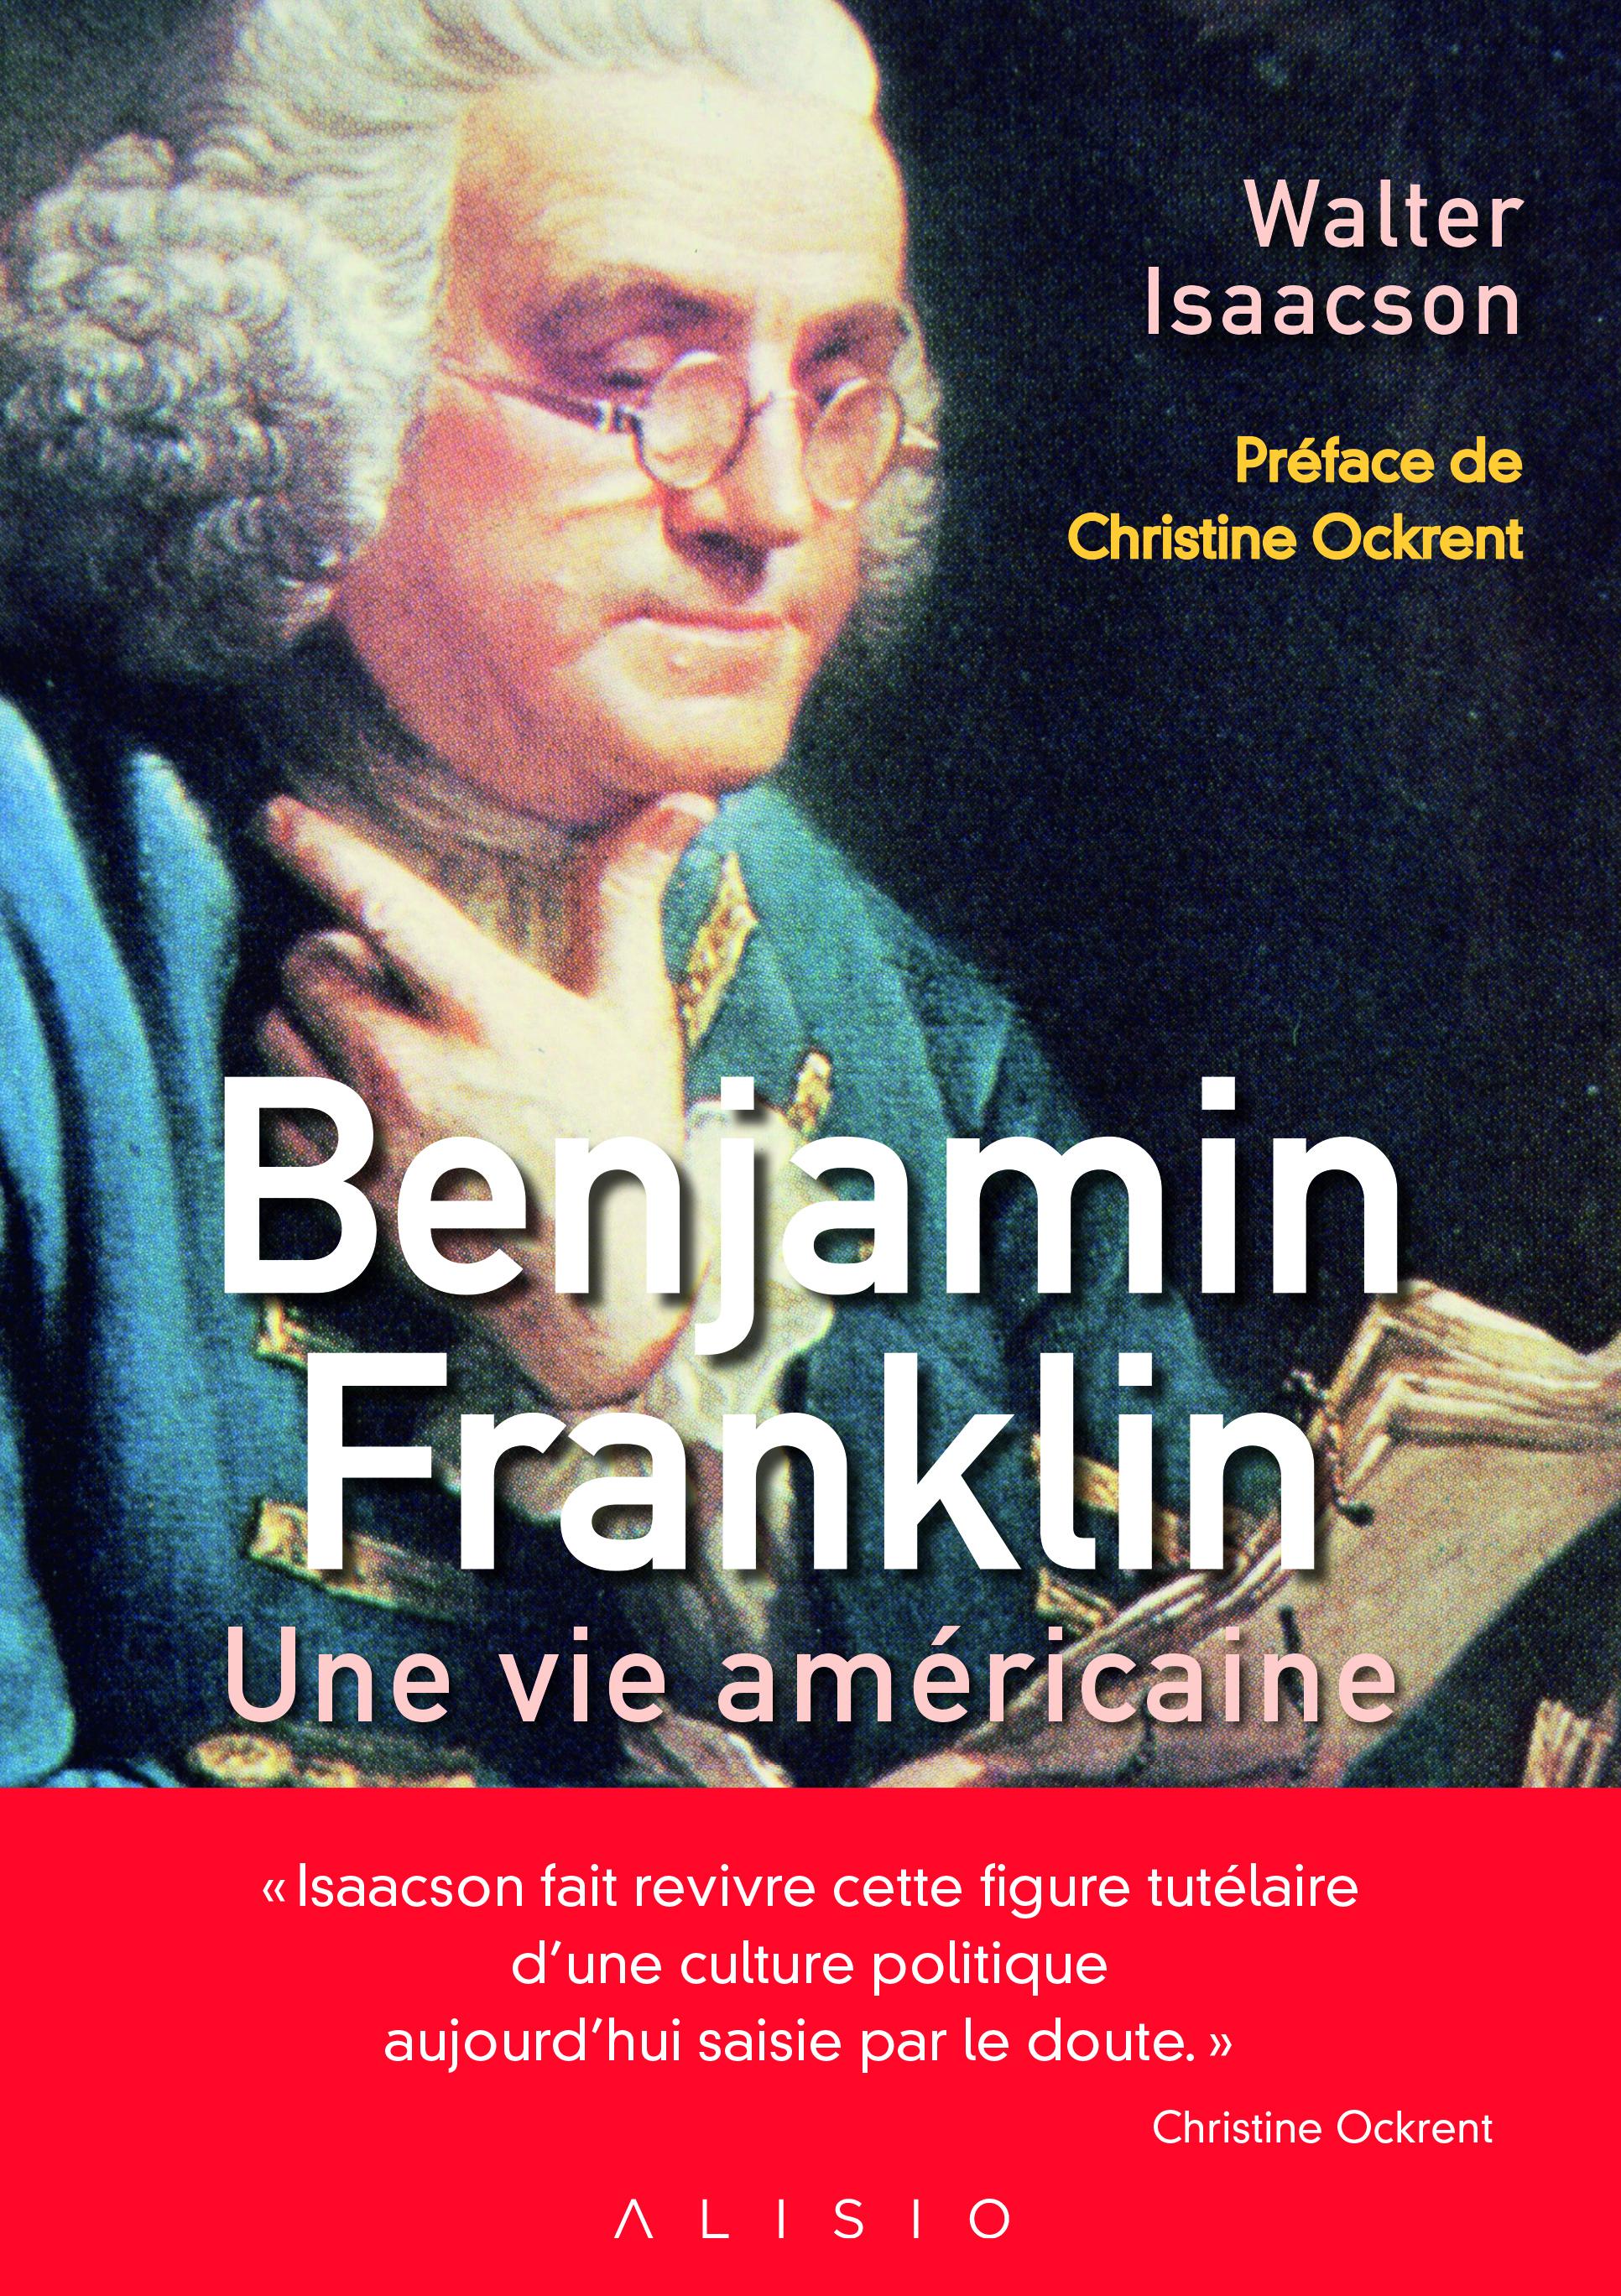 BENJAMIN FRANKLIN : UNE VIE AMERICAINE